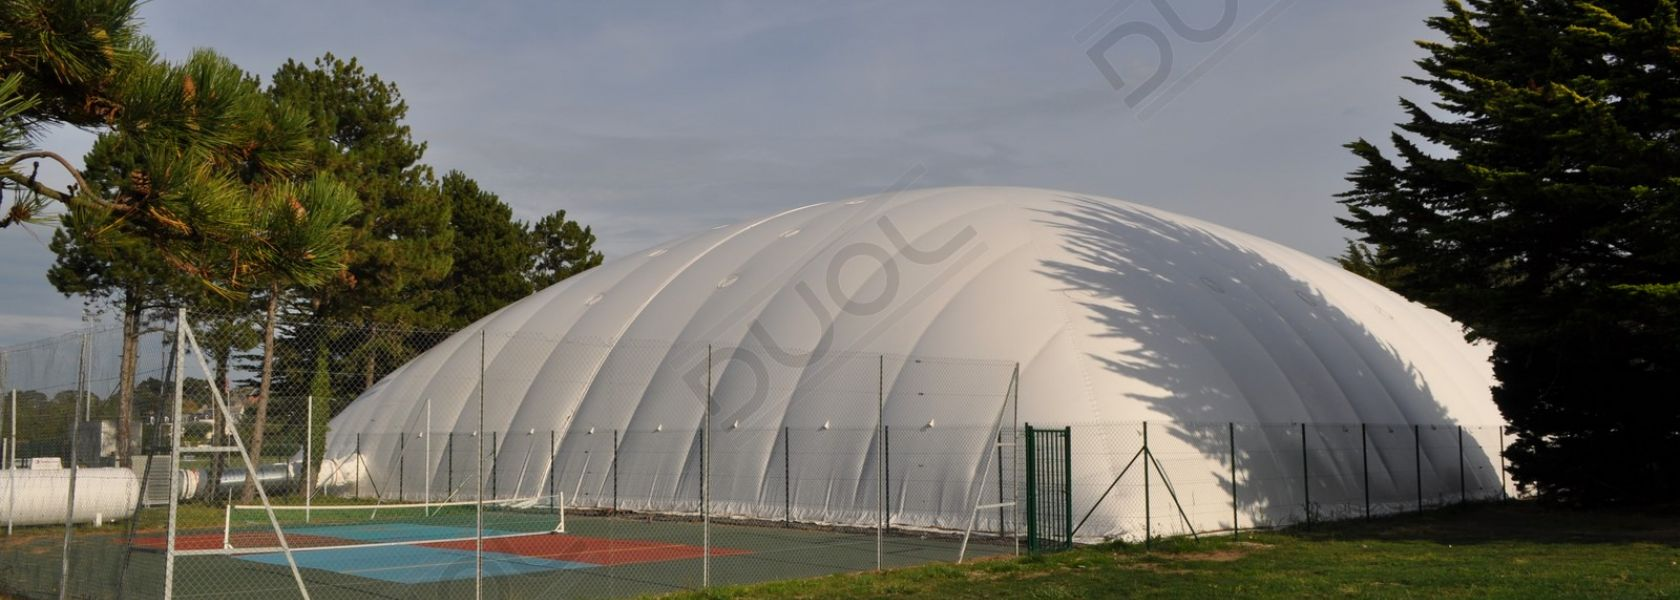 Tennis Club Jeune France